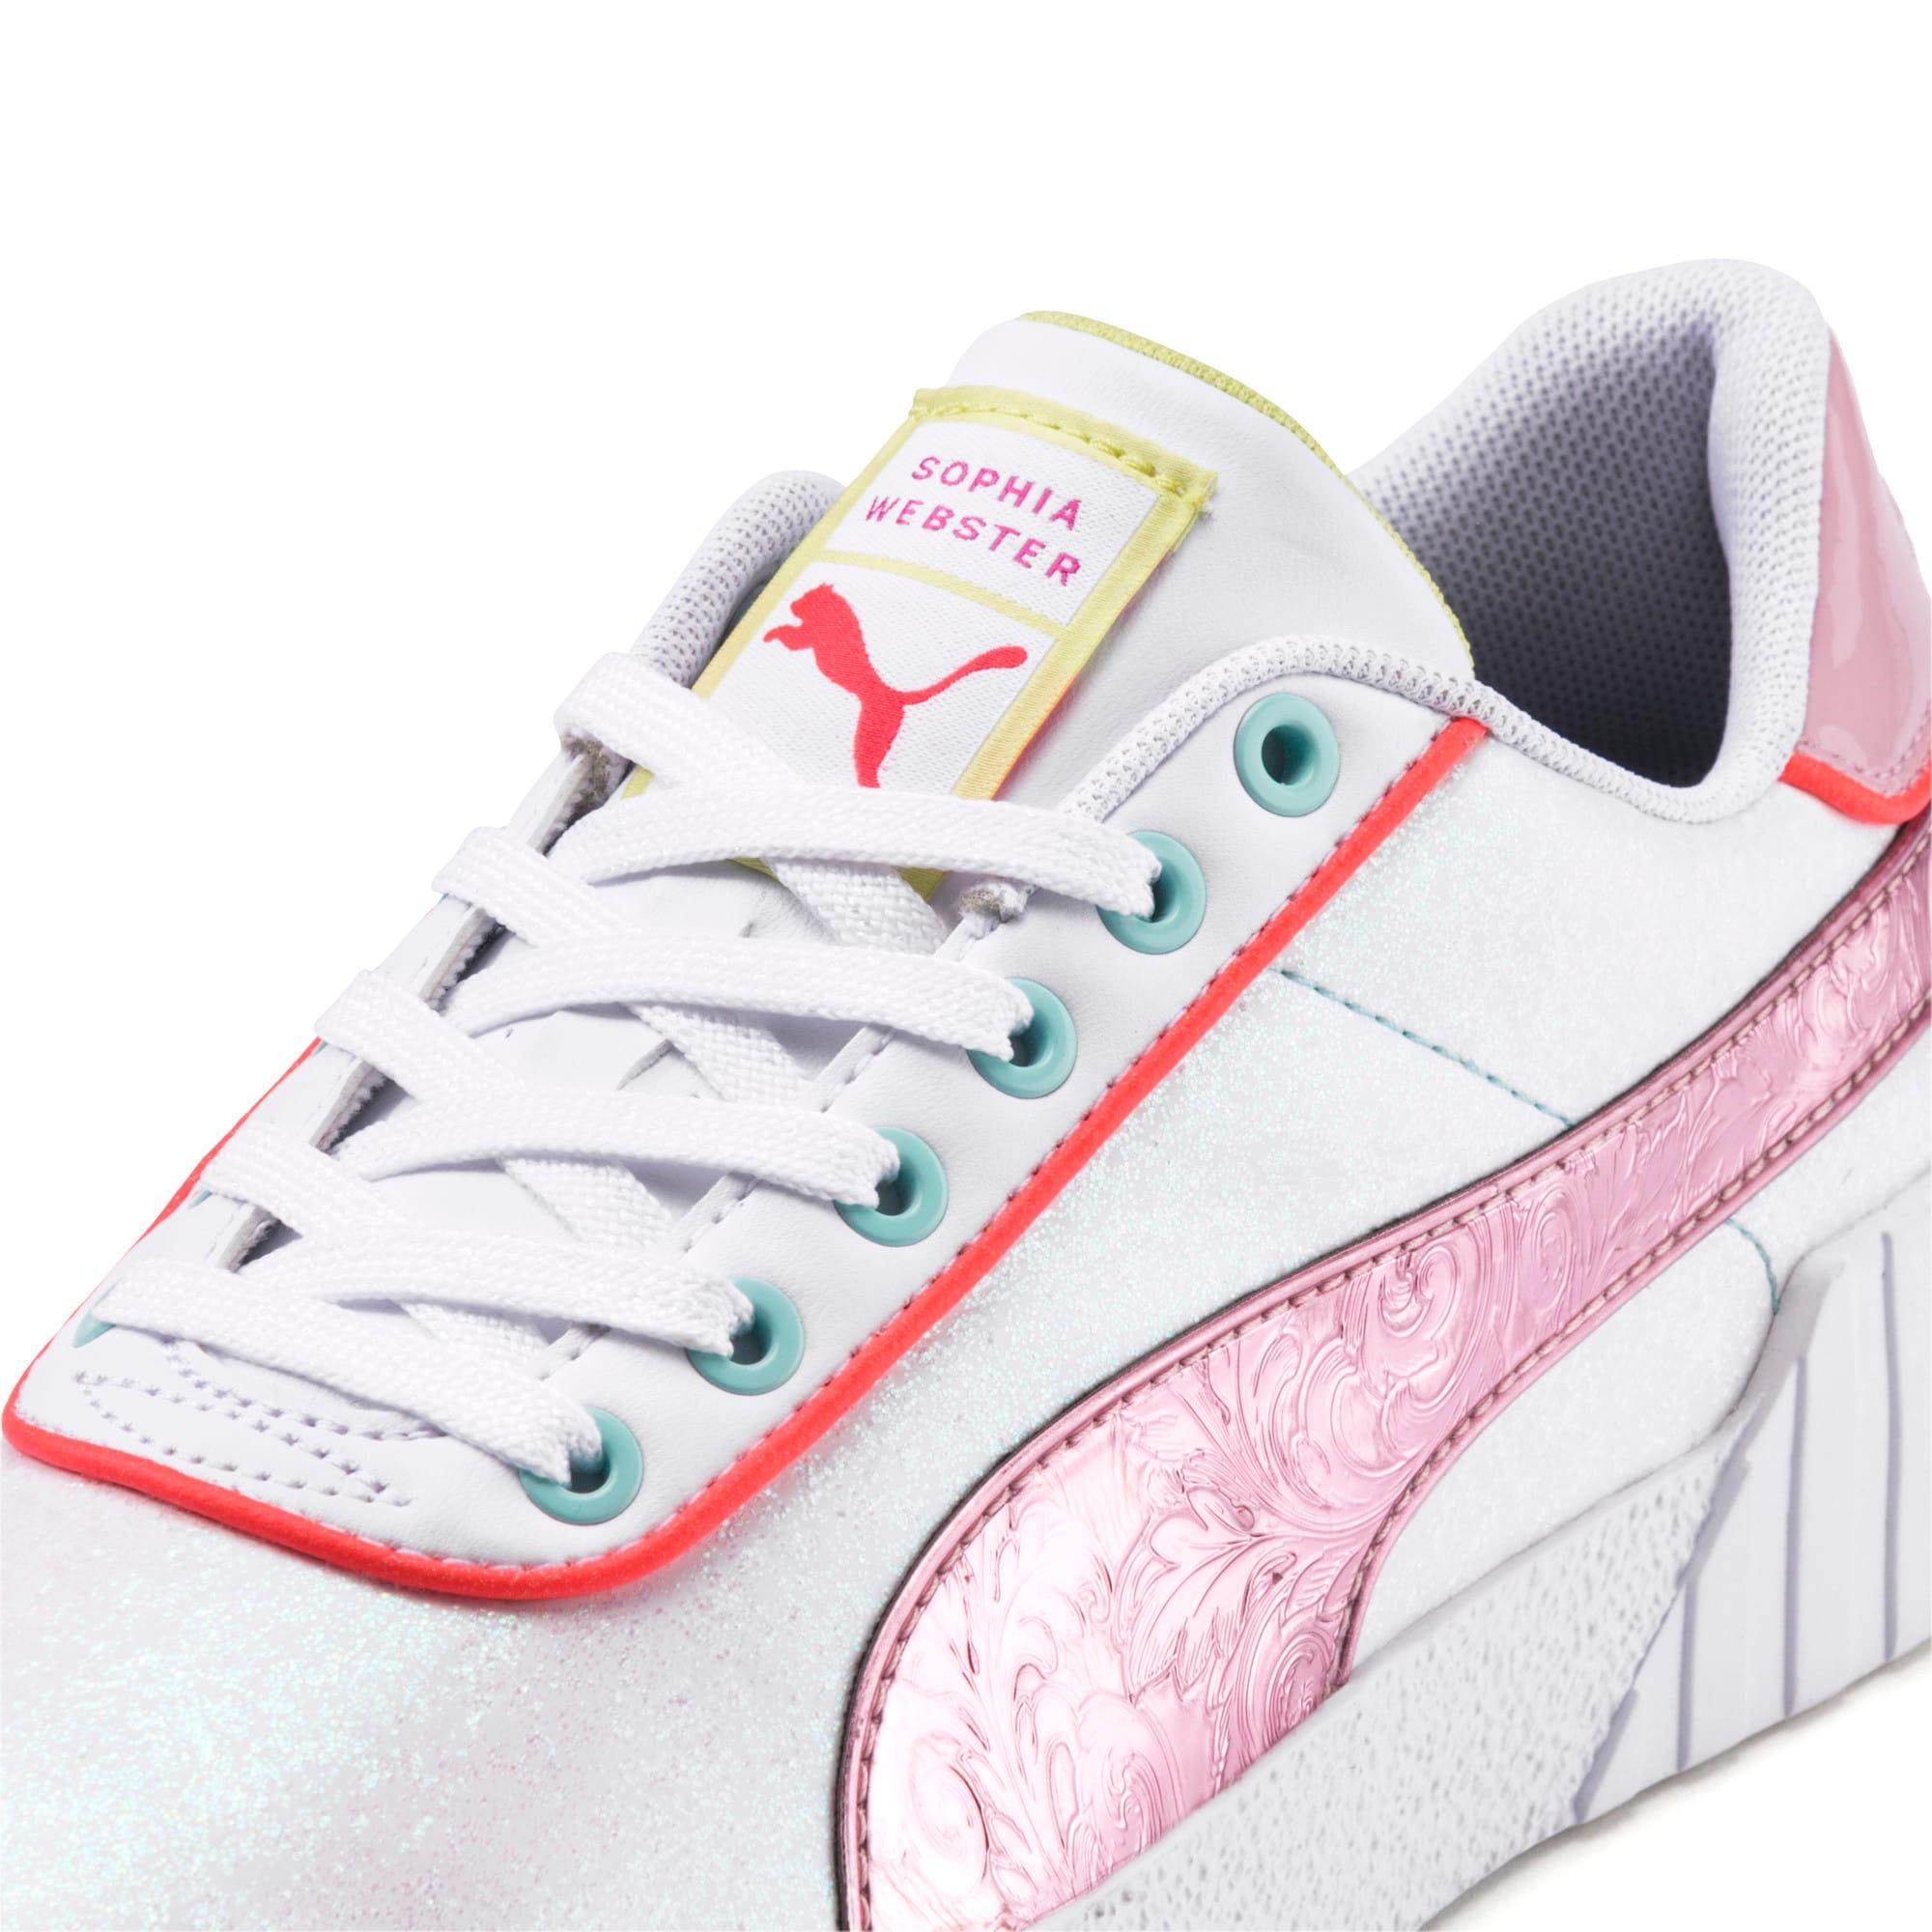 Thumbnail 7 of PUMA x SOPHIA WEBSTER Cali Women's Sneakers, Puma White-Pale Pink, medium